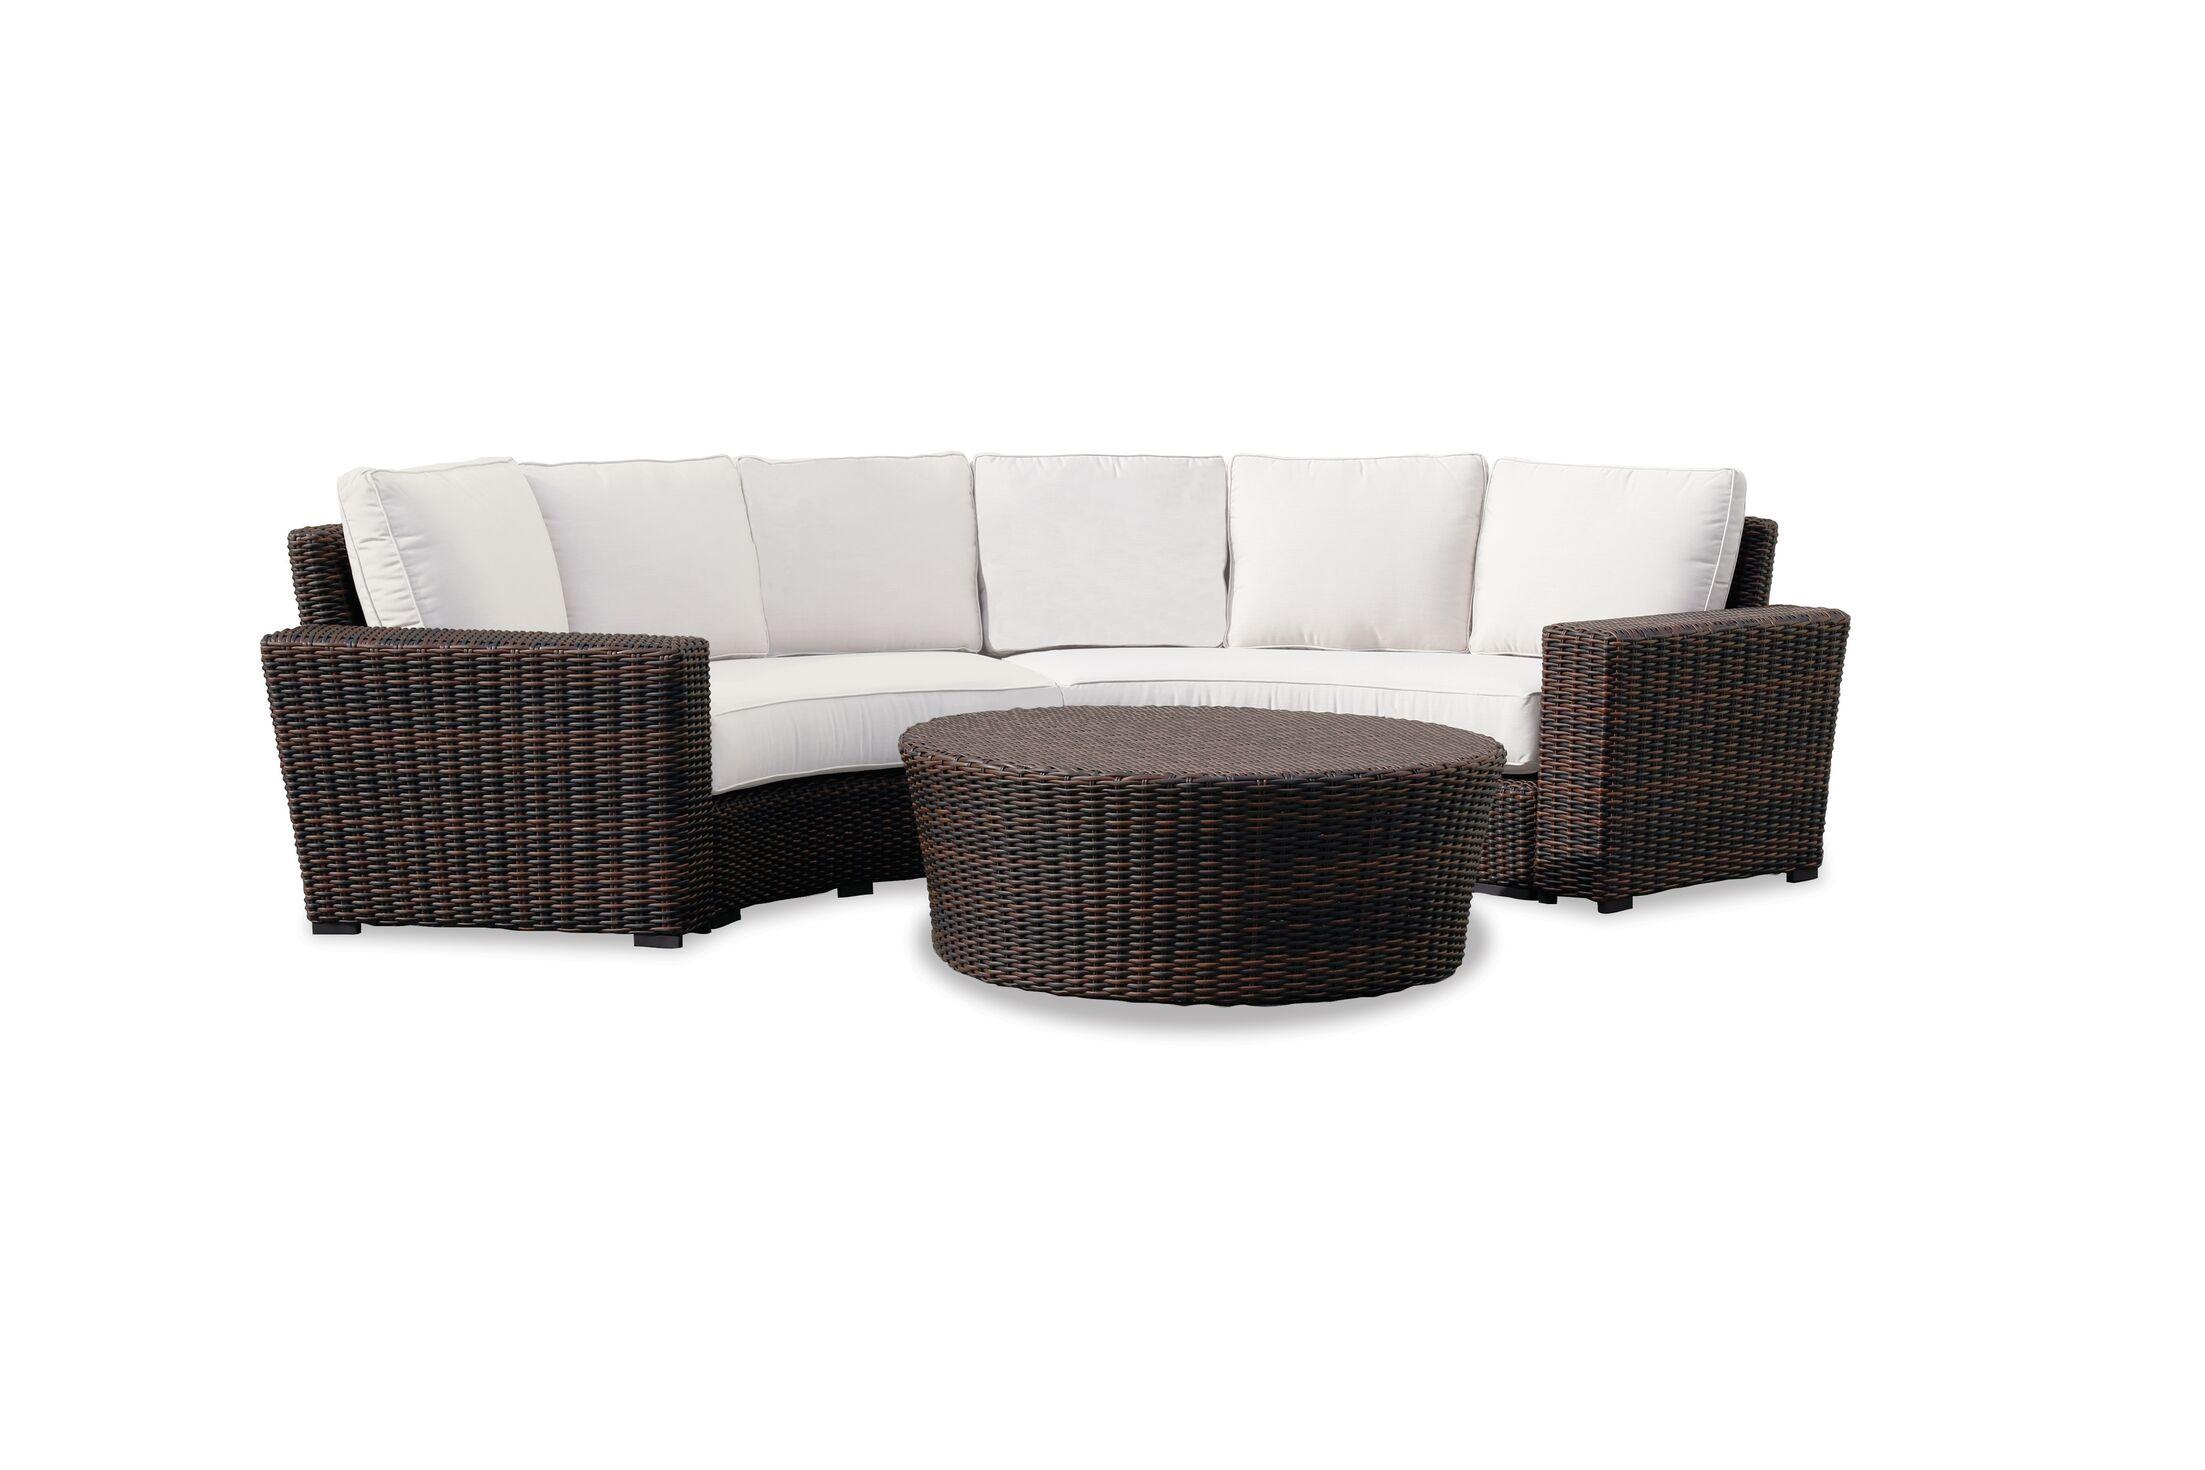 Montecito Curved Loveseat with Sunbrella Cushions